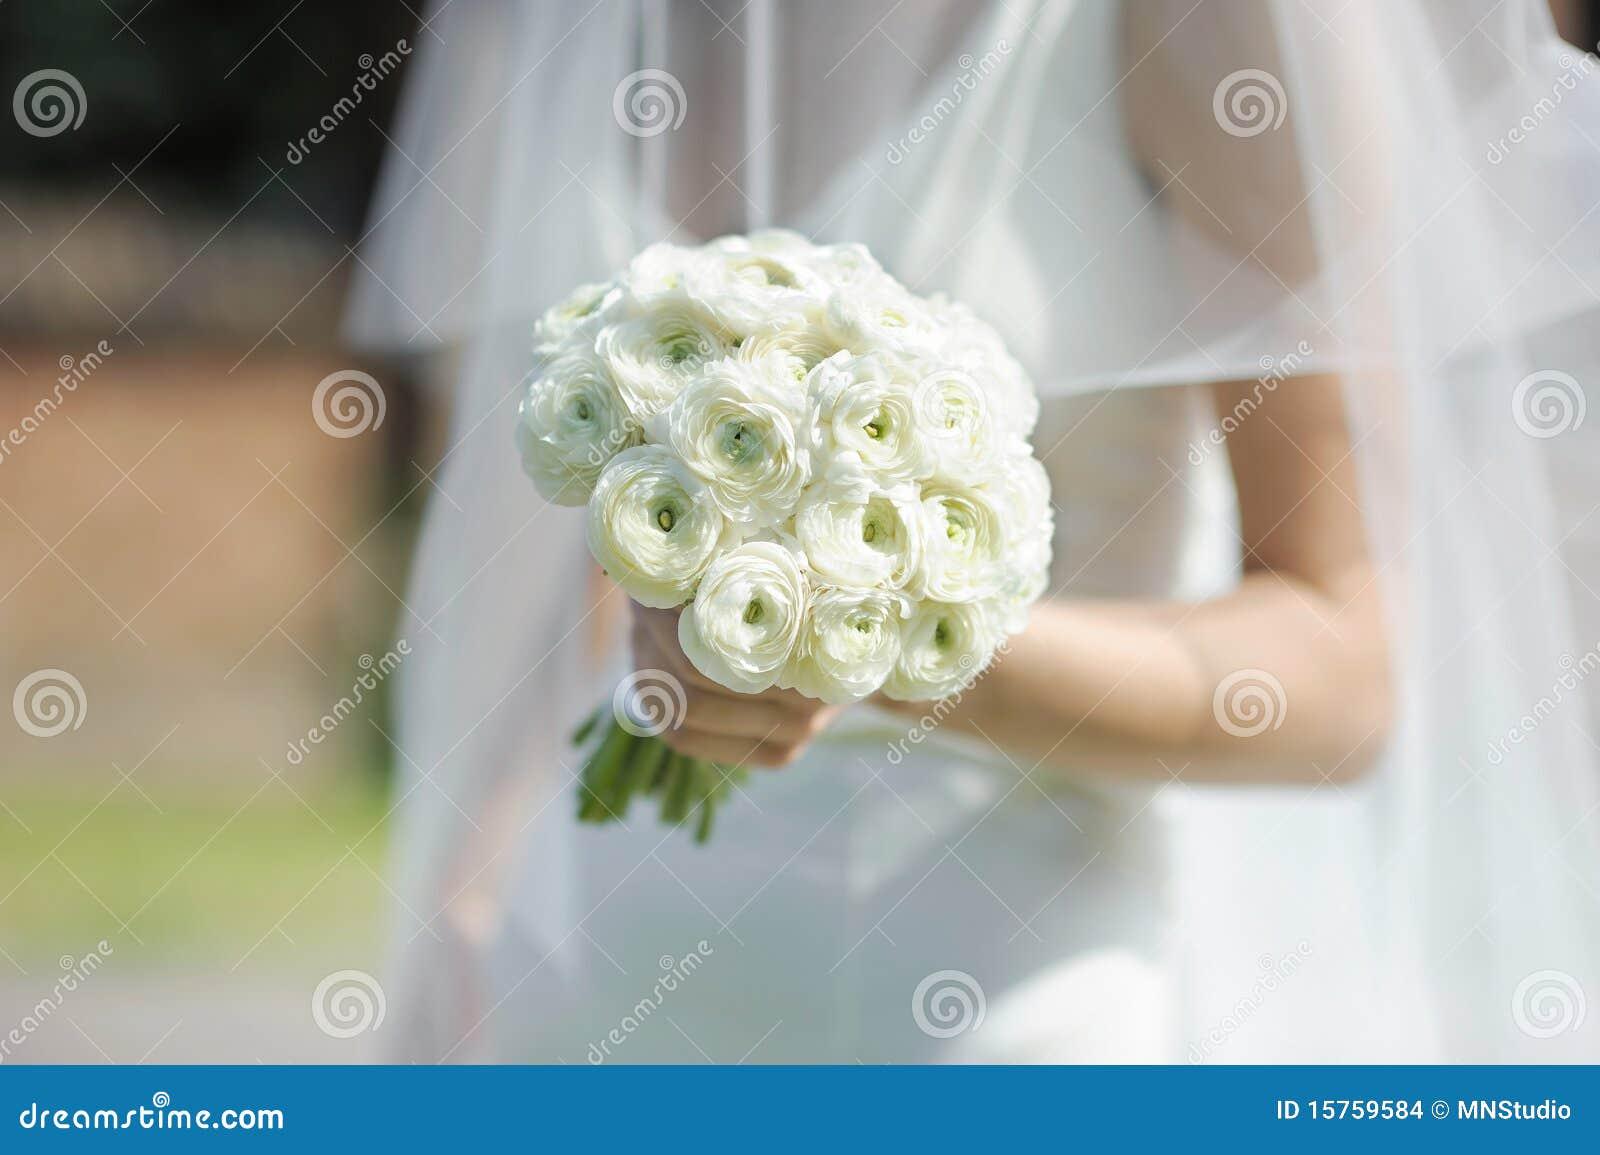 Bride holding white wedding flowers bouquet stock photo image of bride holding white wedding flowers bouquet izmirmasajfo Images